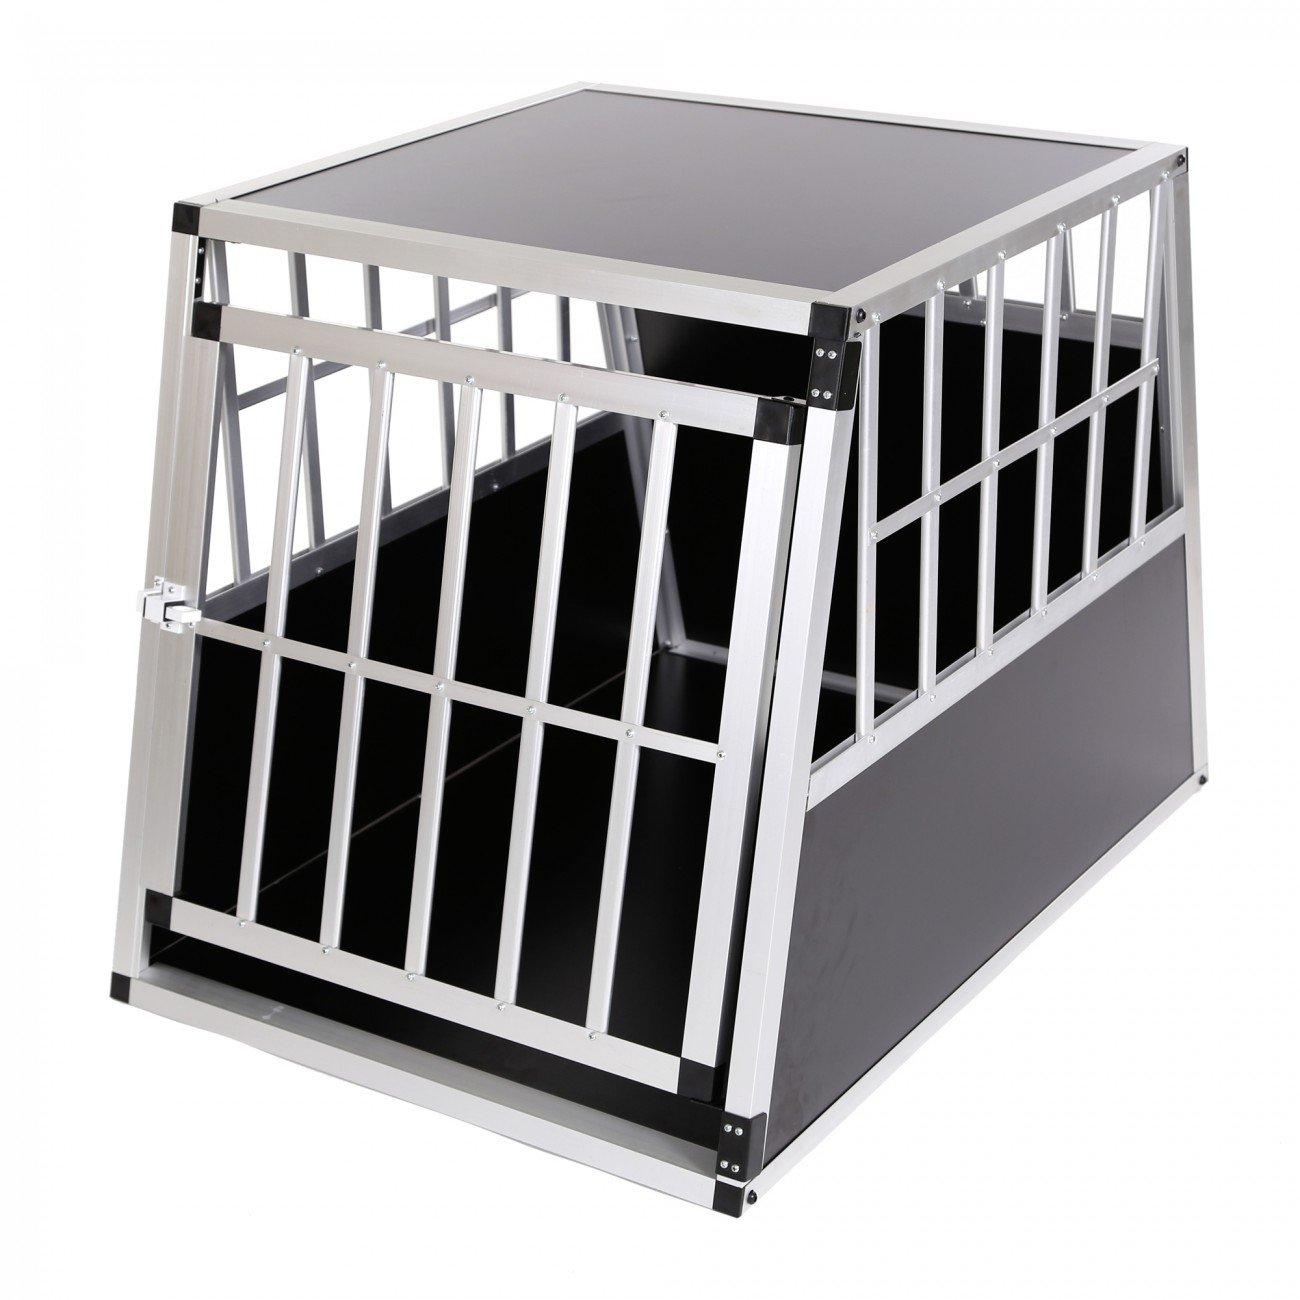 Zoomundo Alu Hundetransportbox 1 Türig Premium Image